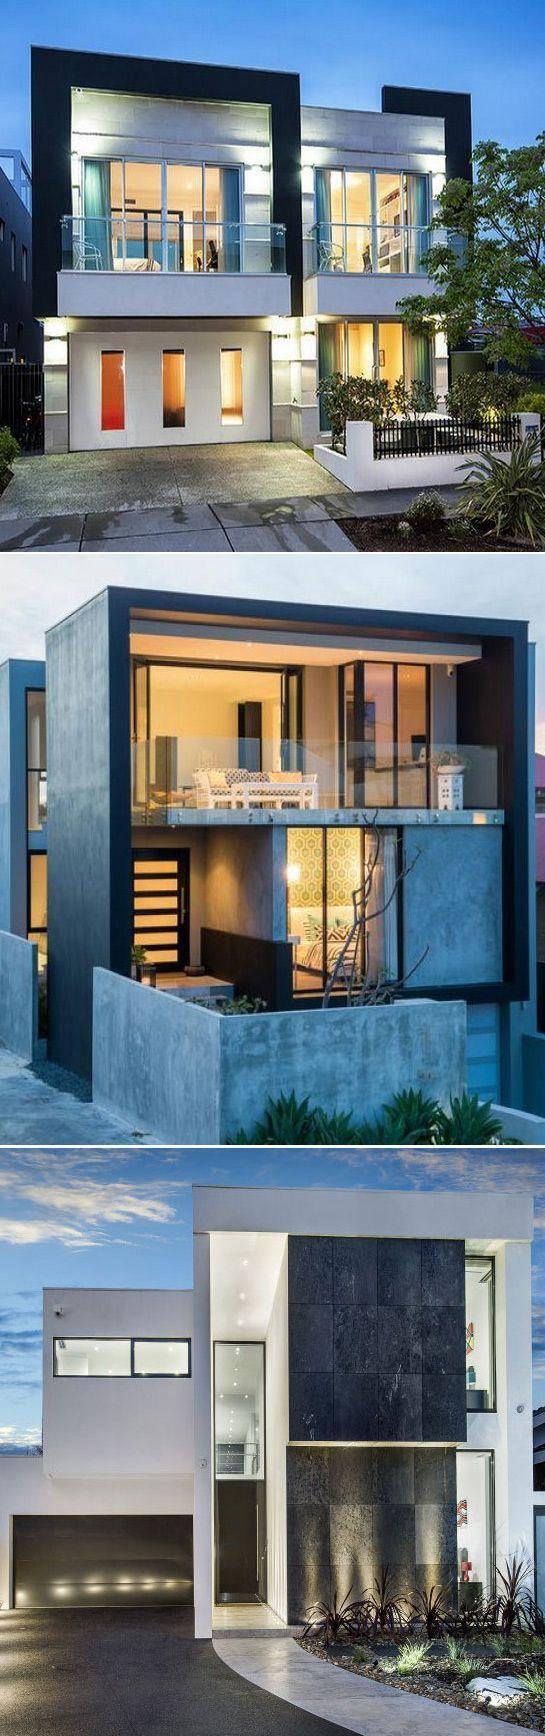 beautiful house - white design